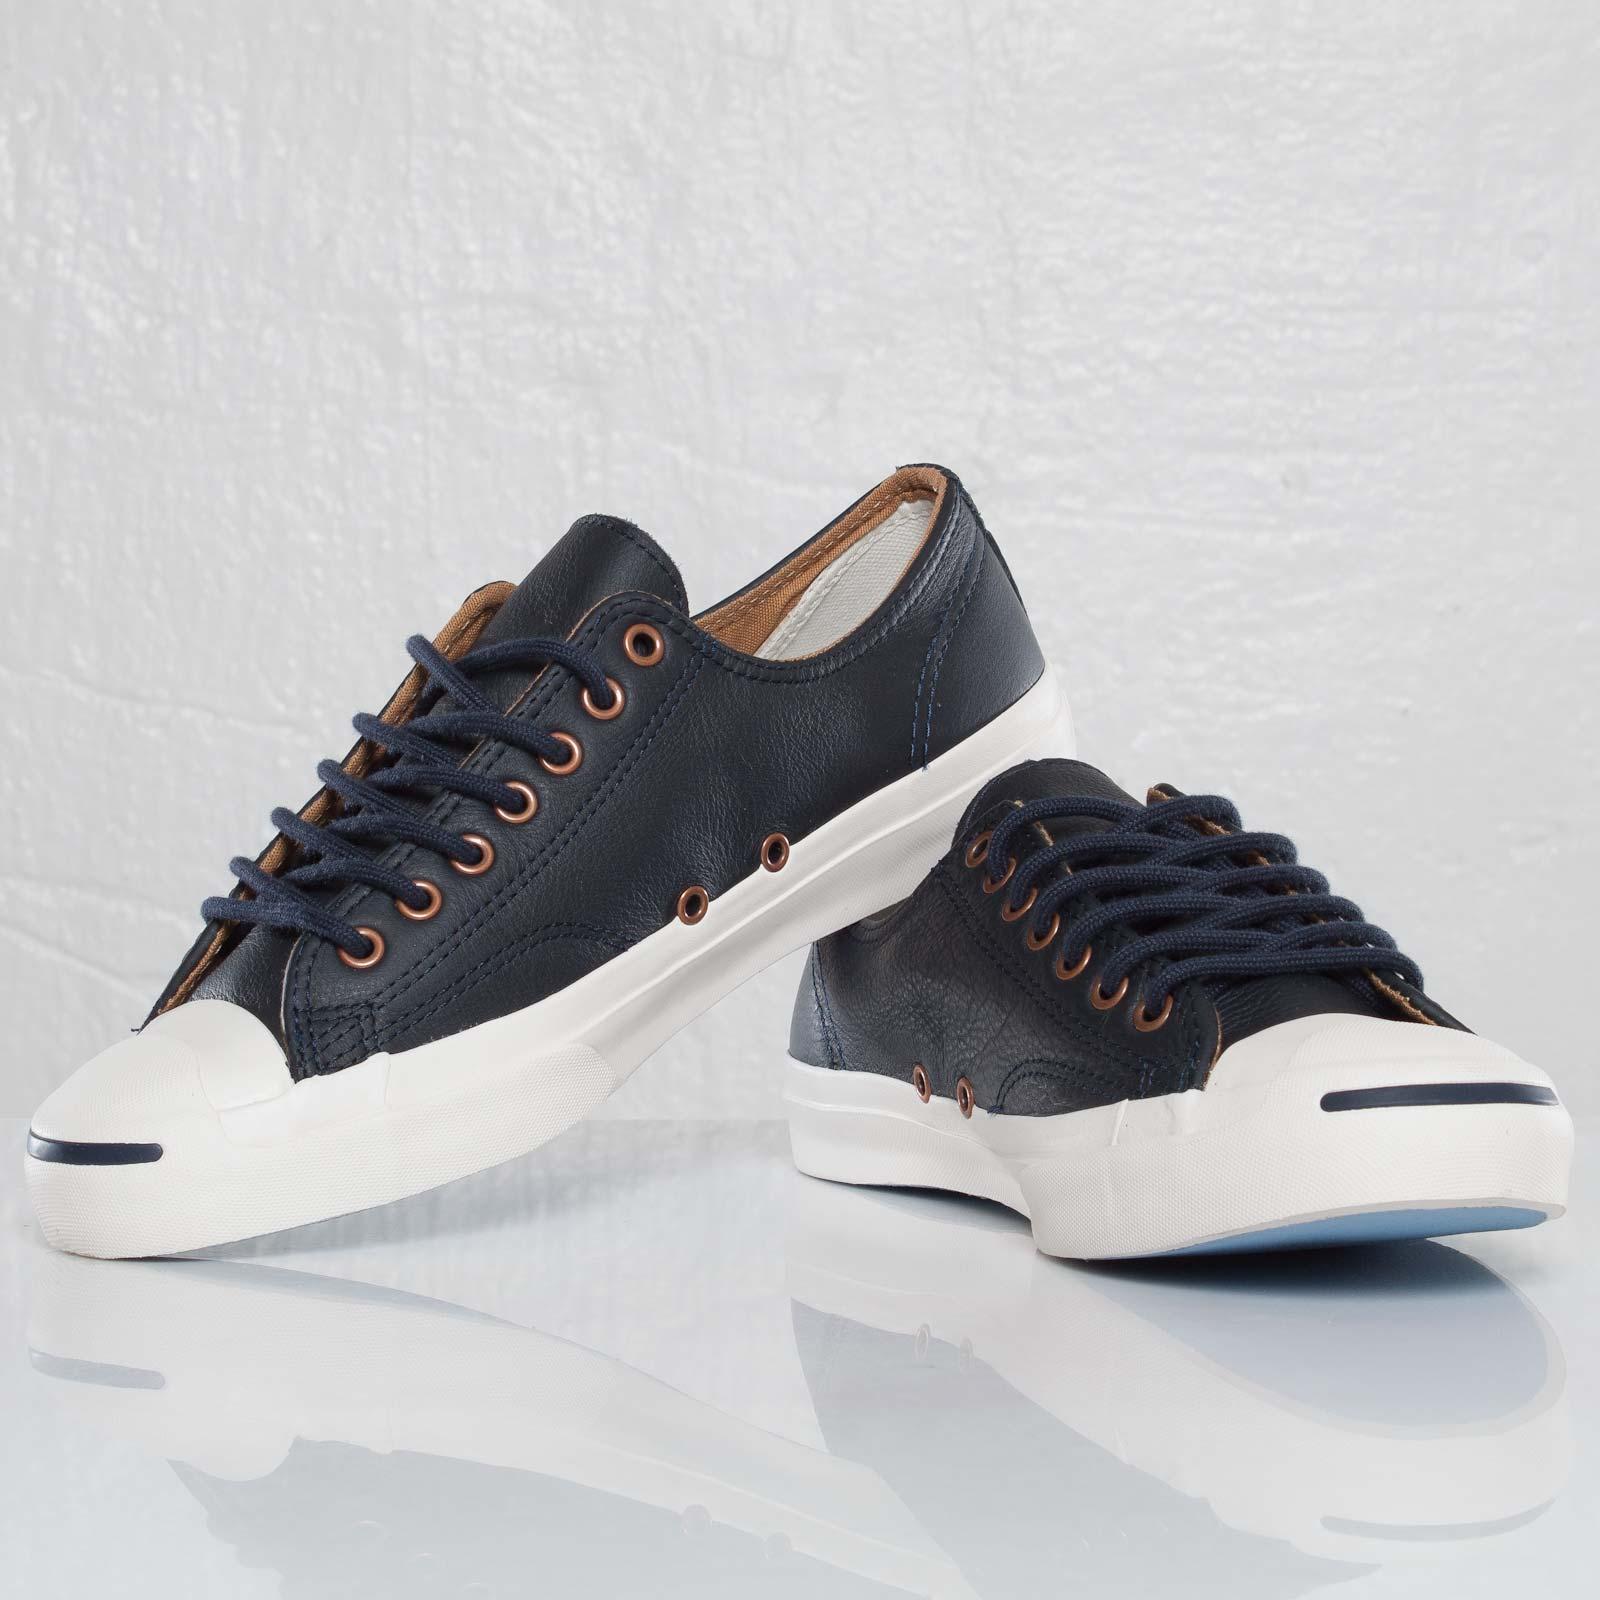 bb4c0157194f ... store converse jack purcell ltt leather ox 54f2a 1f6e6